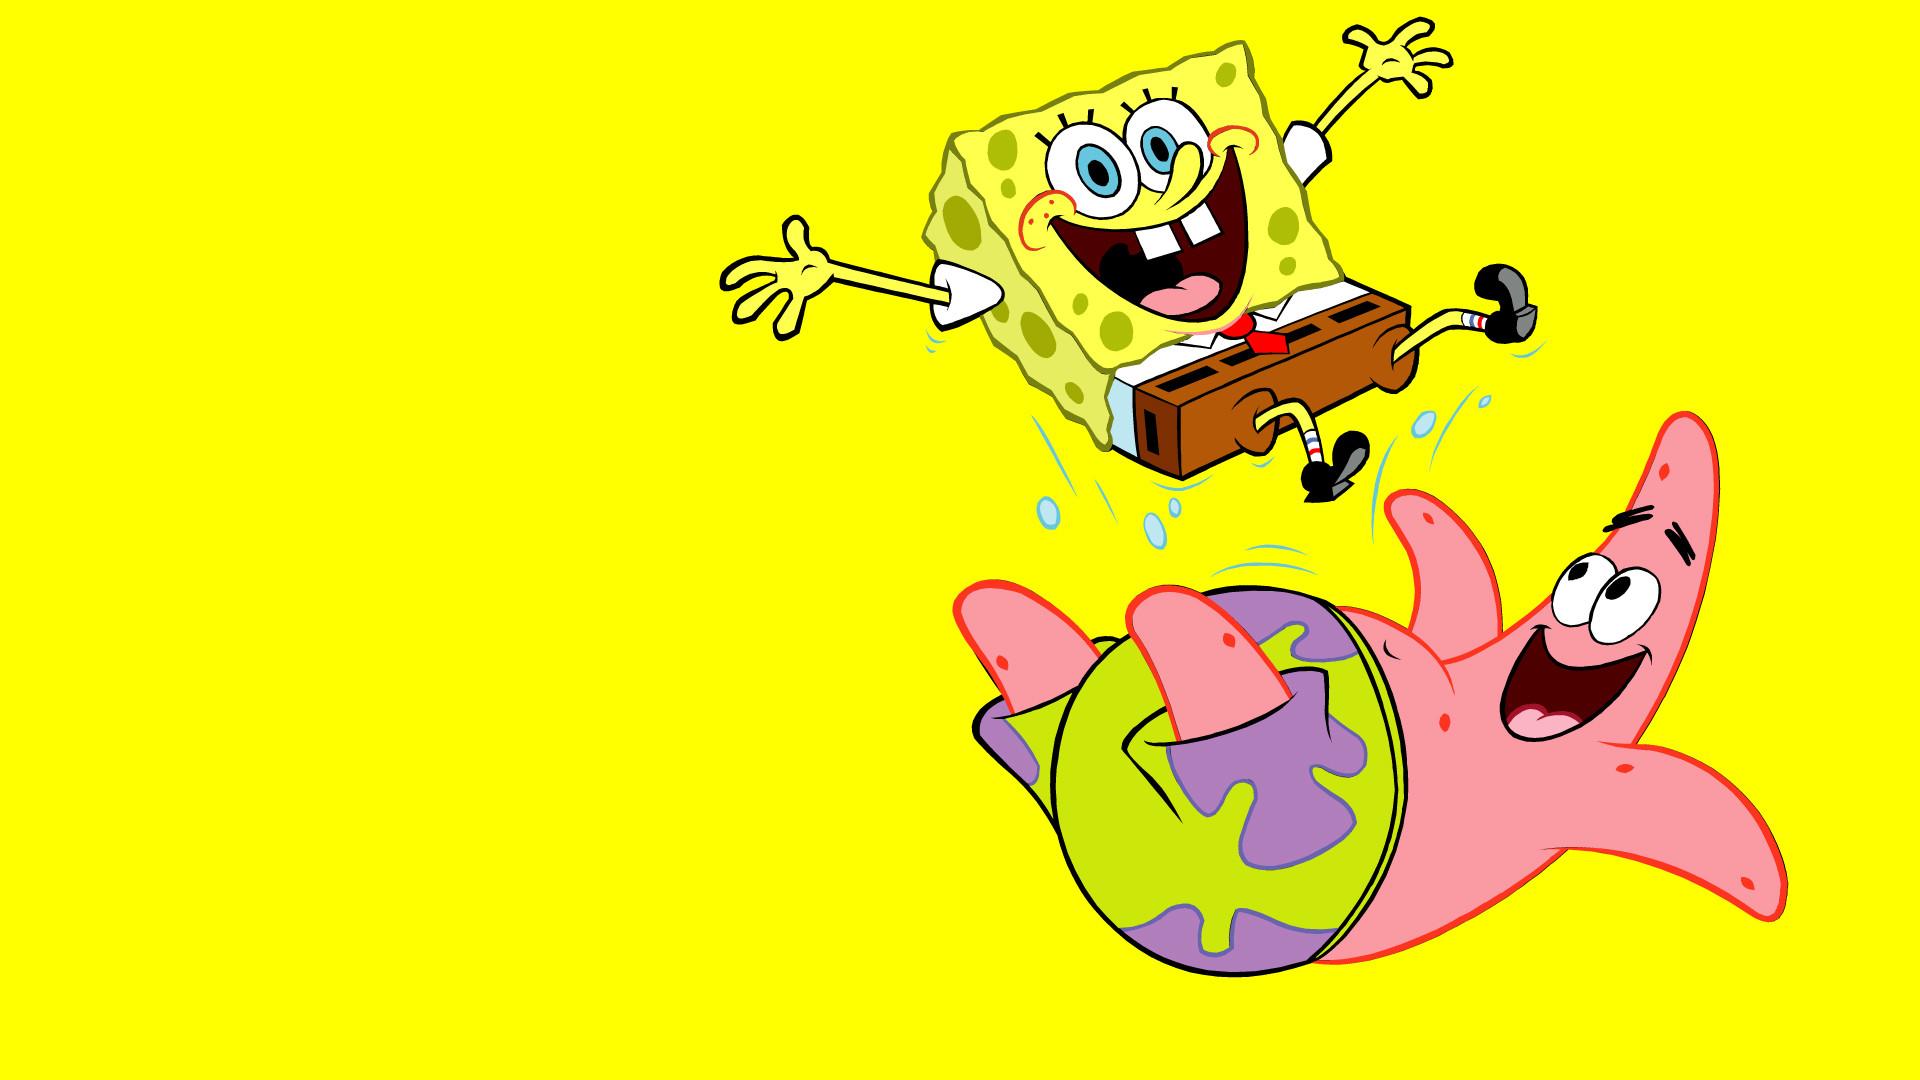 spongebob squarepants background 71